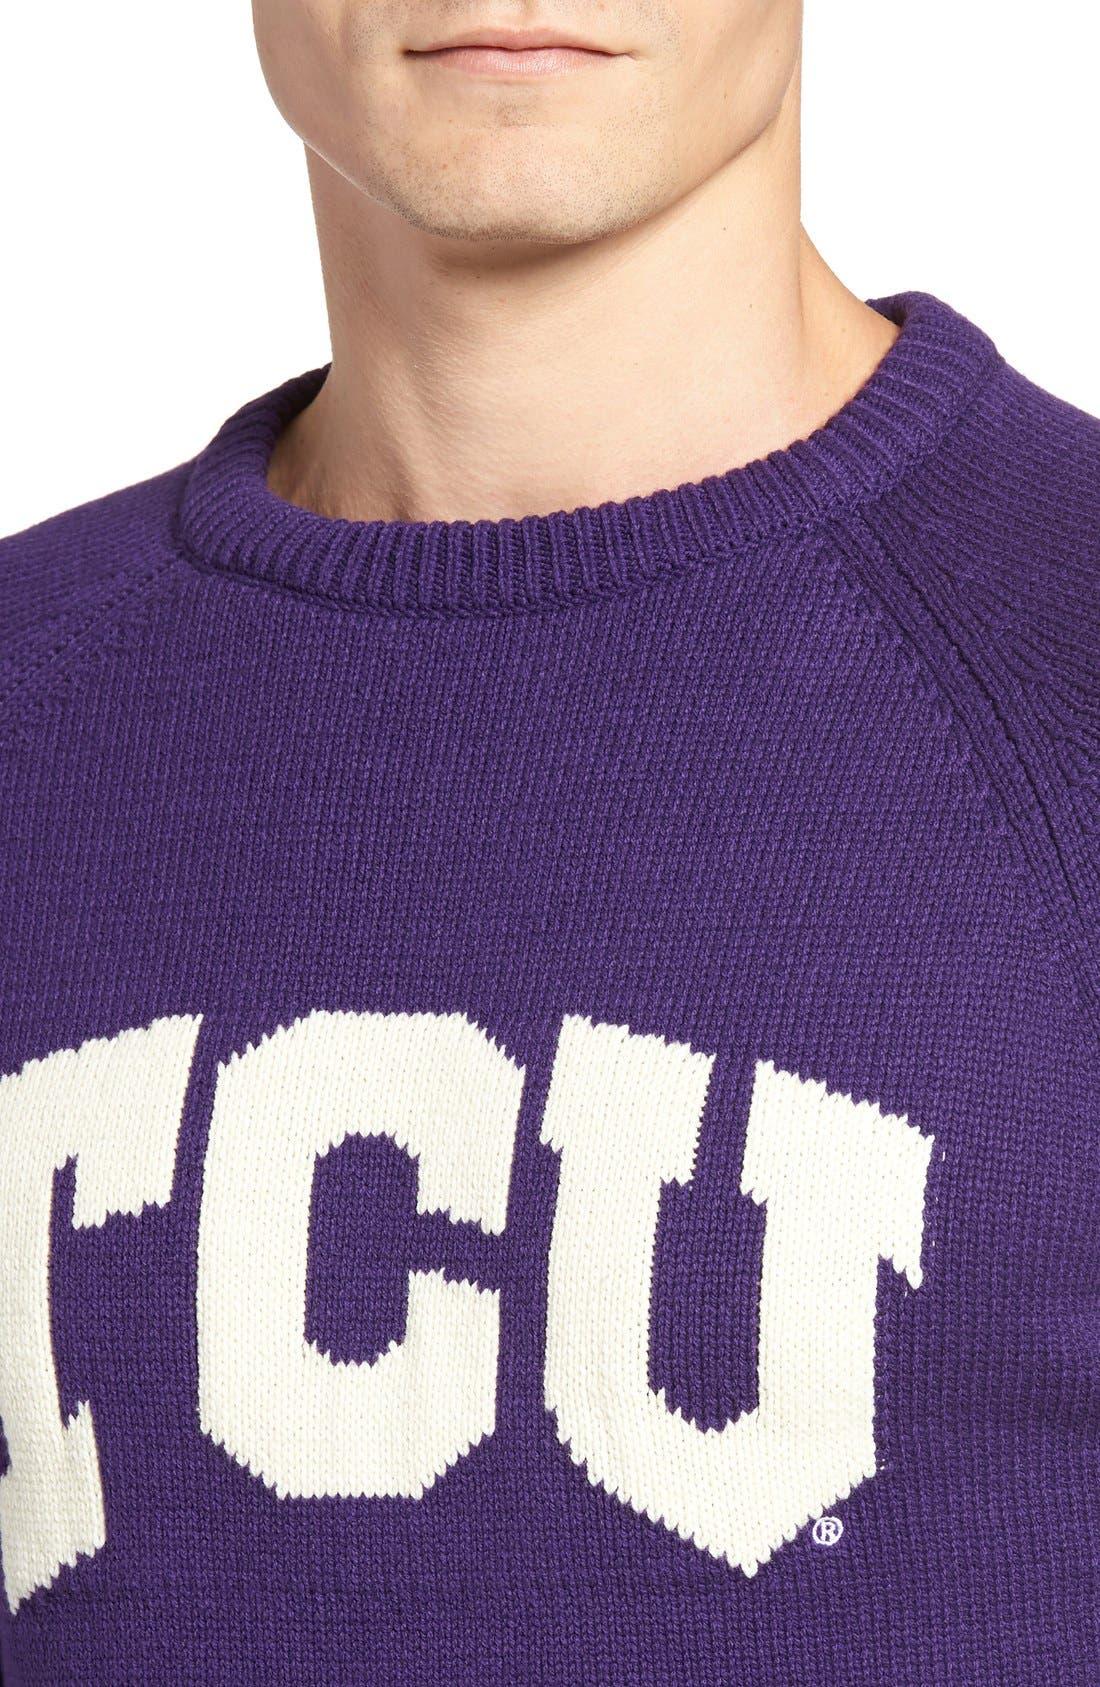 HILLFLINT,                             TCU Heritage Sweater,                             Alternate thumbnail 4, color,                             500